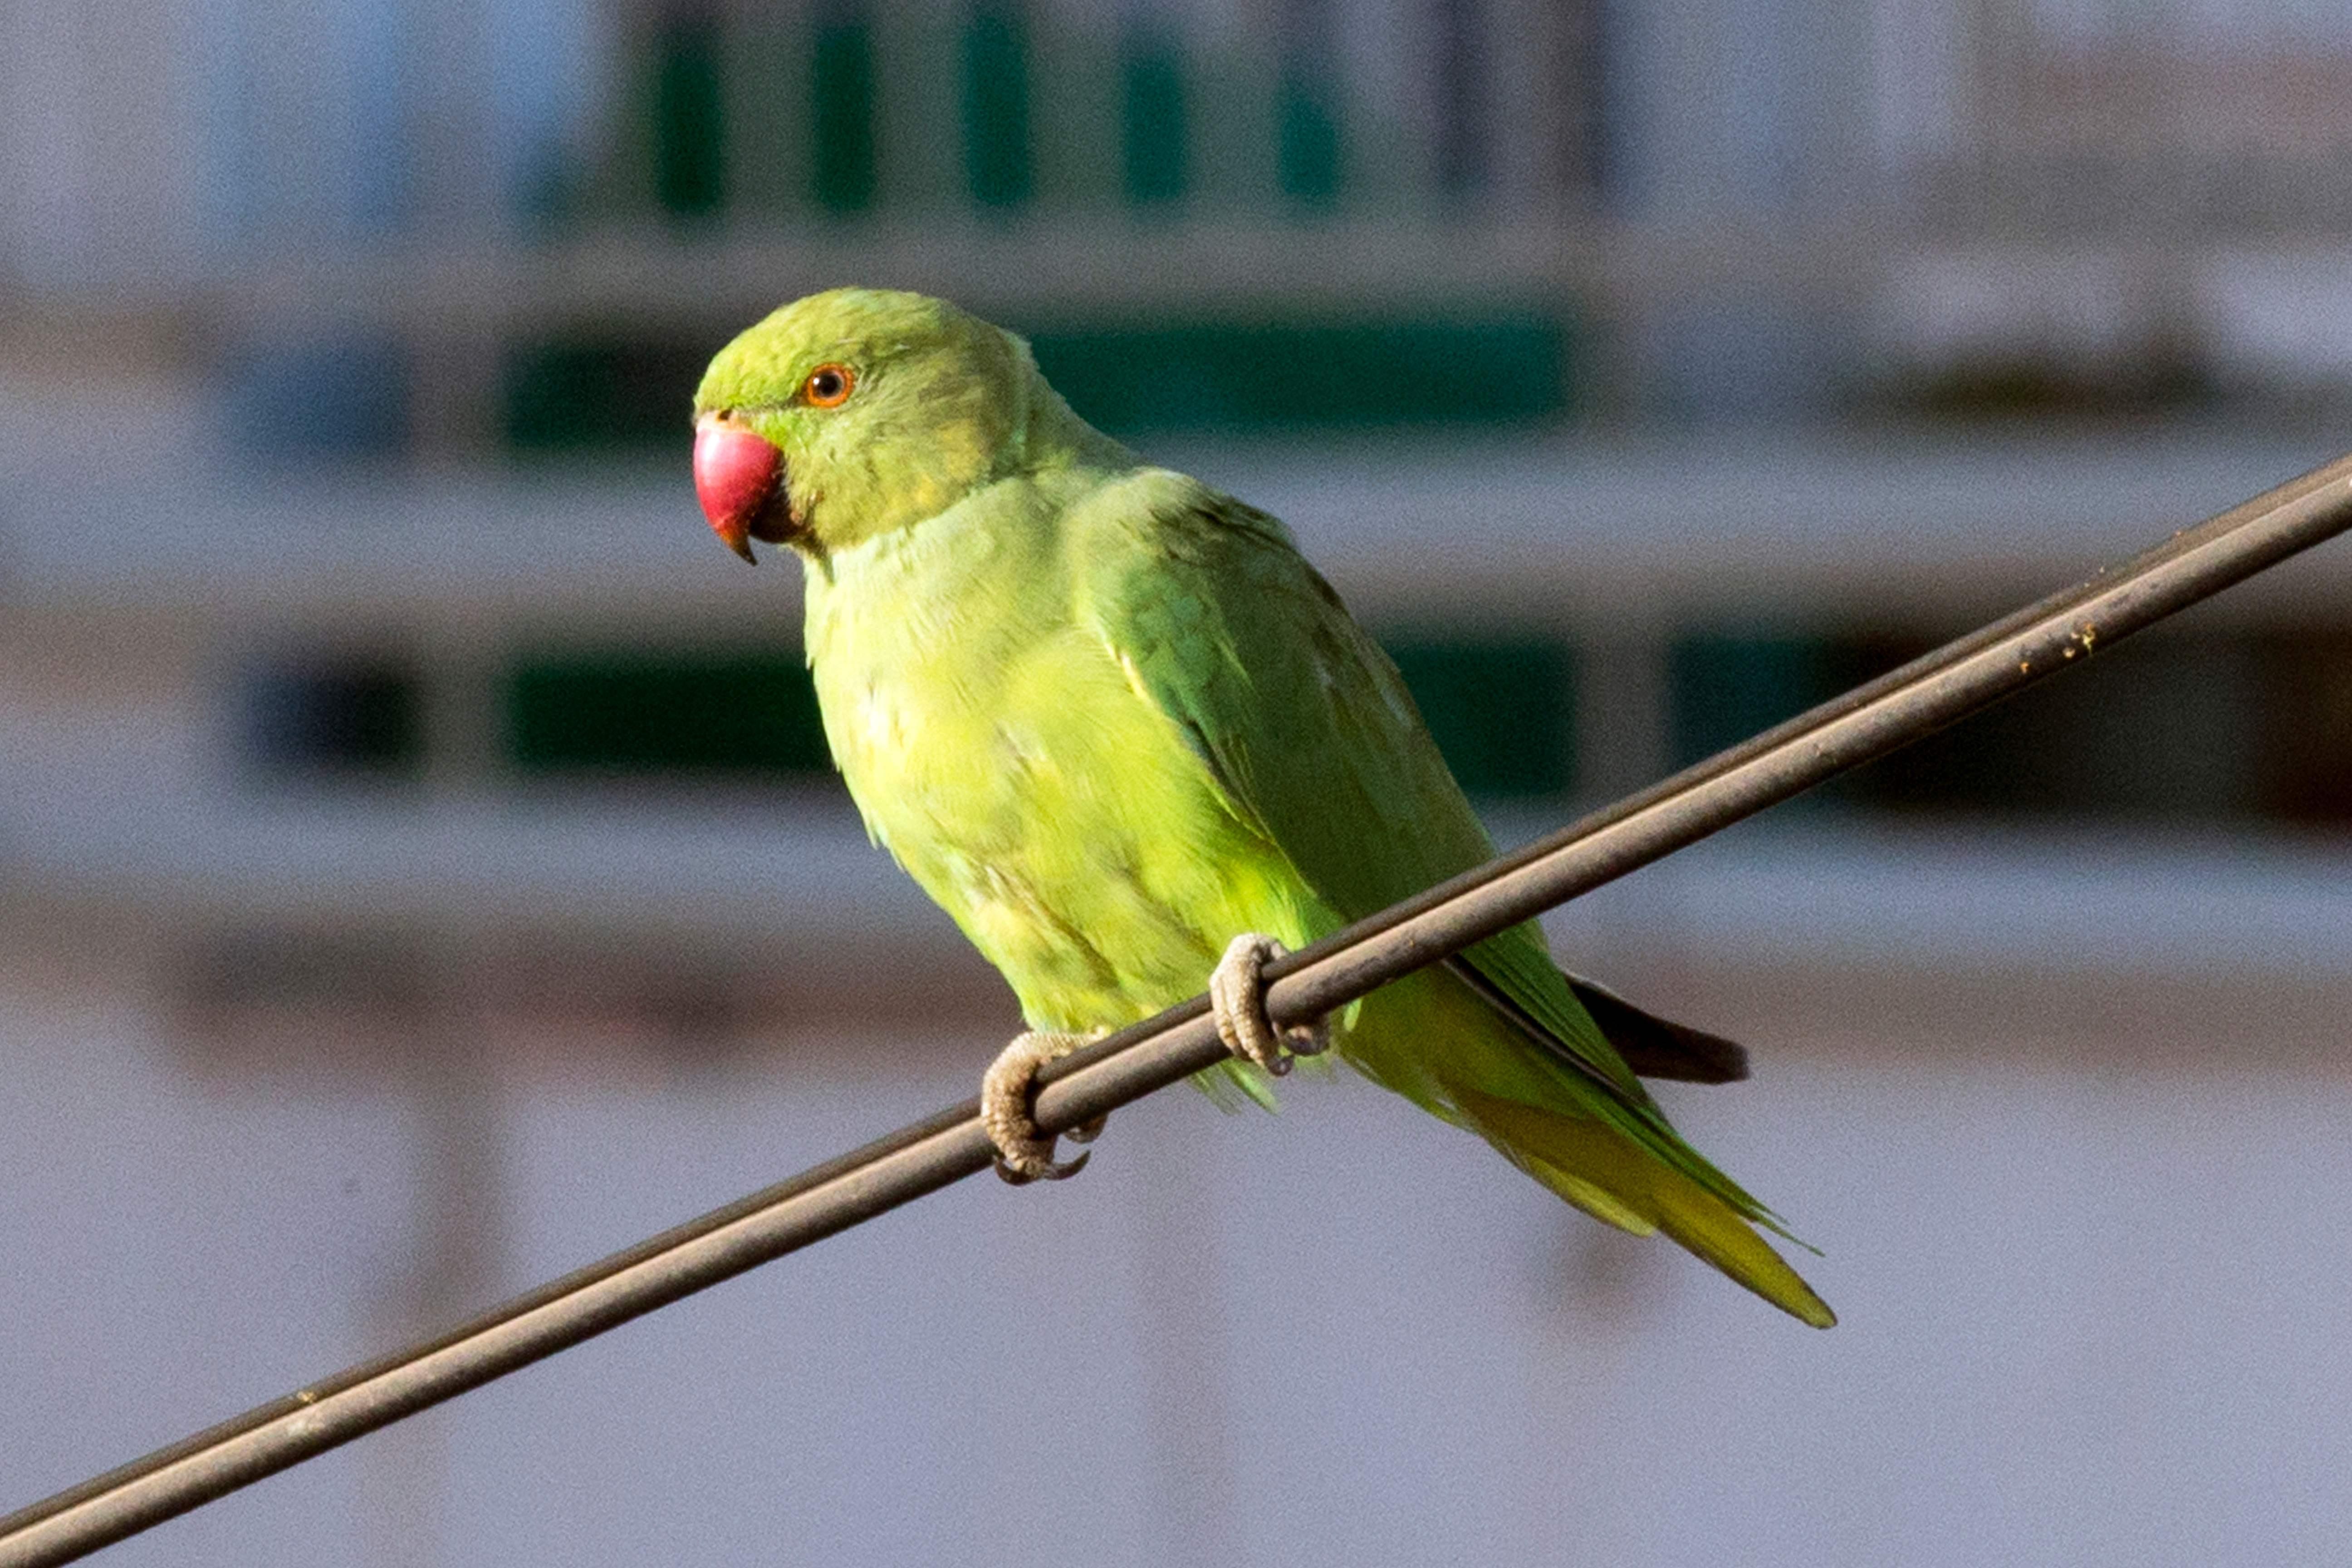 FILES-ISRAEL-NETHERLANDS-ANIMAL-BIRD